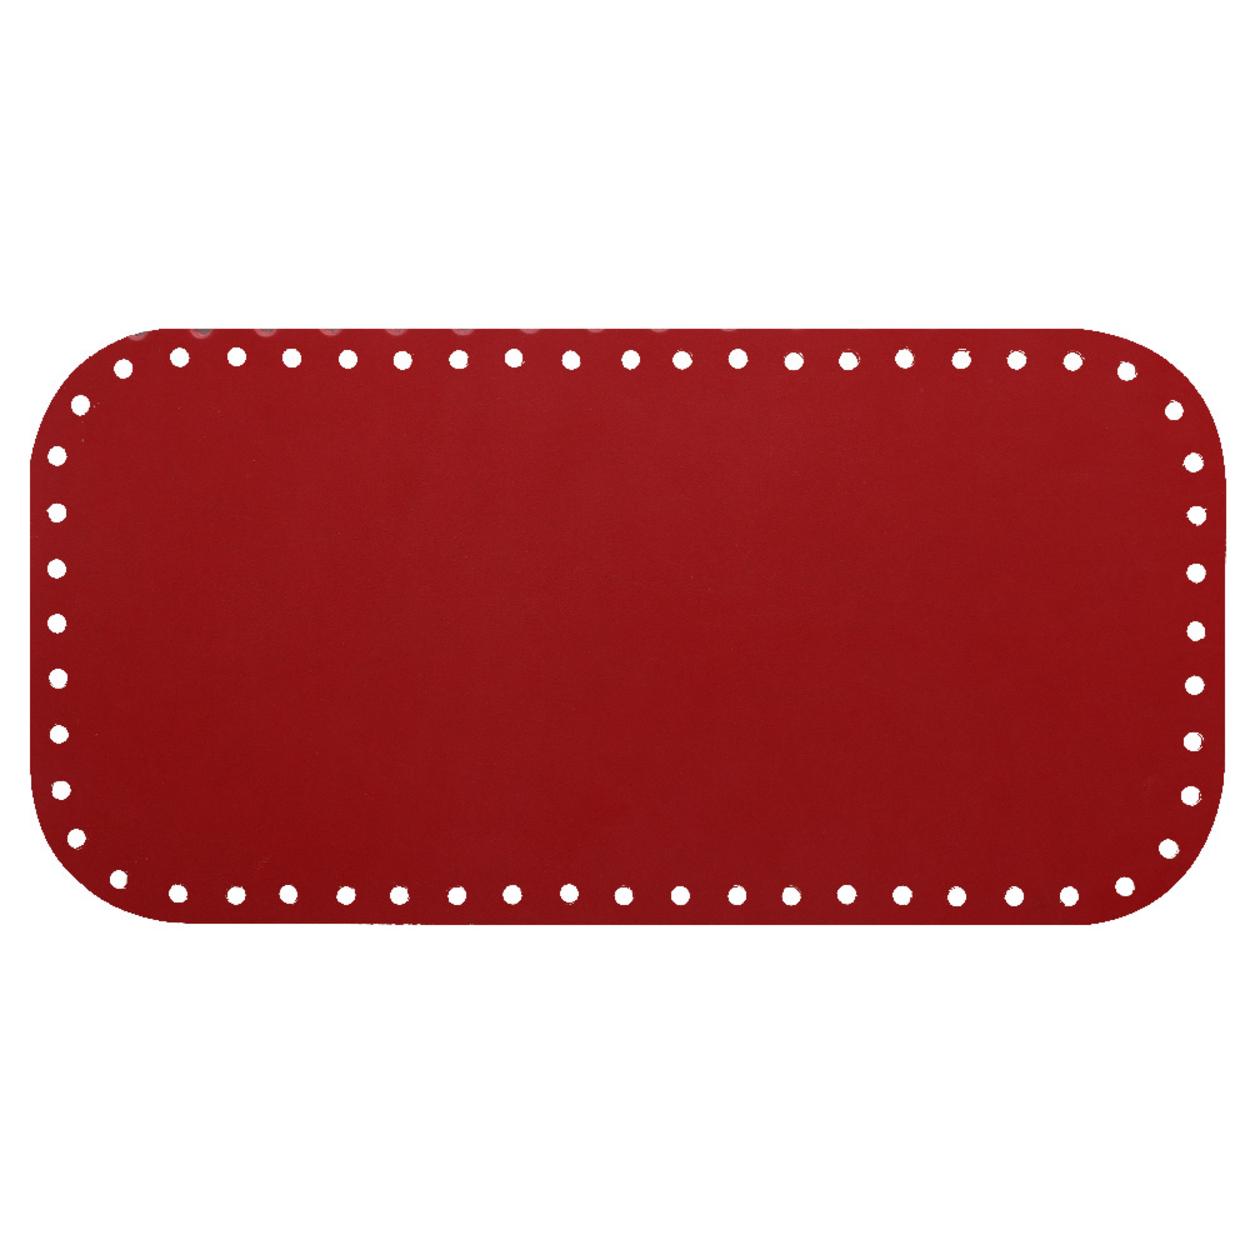 Кожа - Дно для сумки 15 х 30 см. Red hot